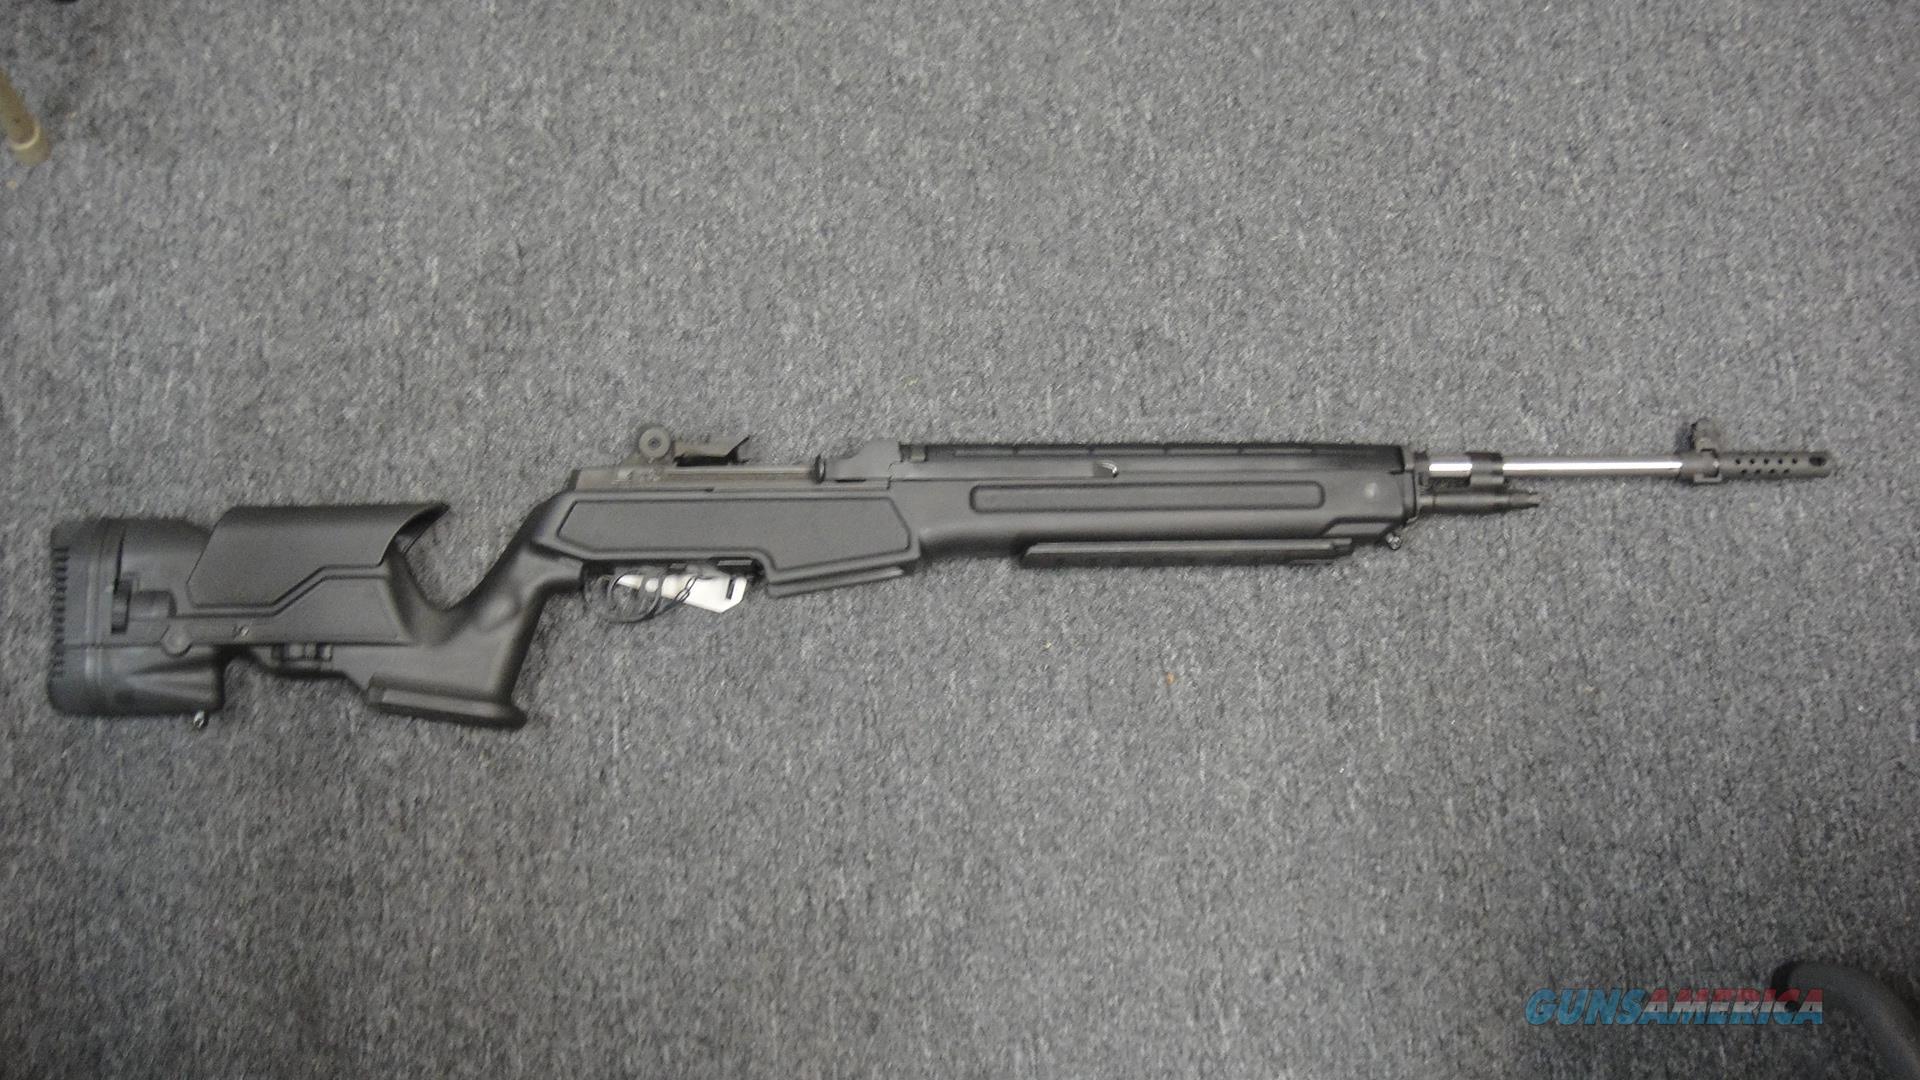 Springfield Armory M1A Precision 6.5 Creedmoor  Guns > Rifles > Springfield Armory Rifles > M1A/M14